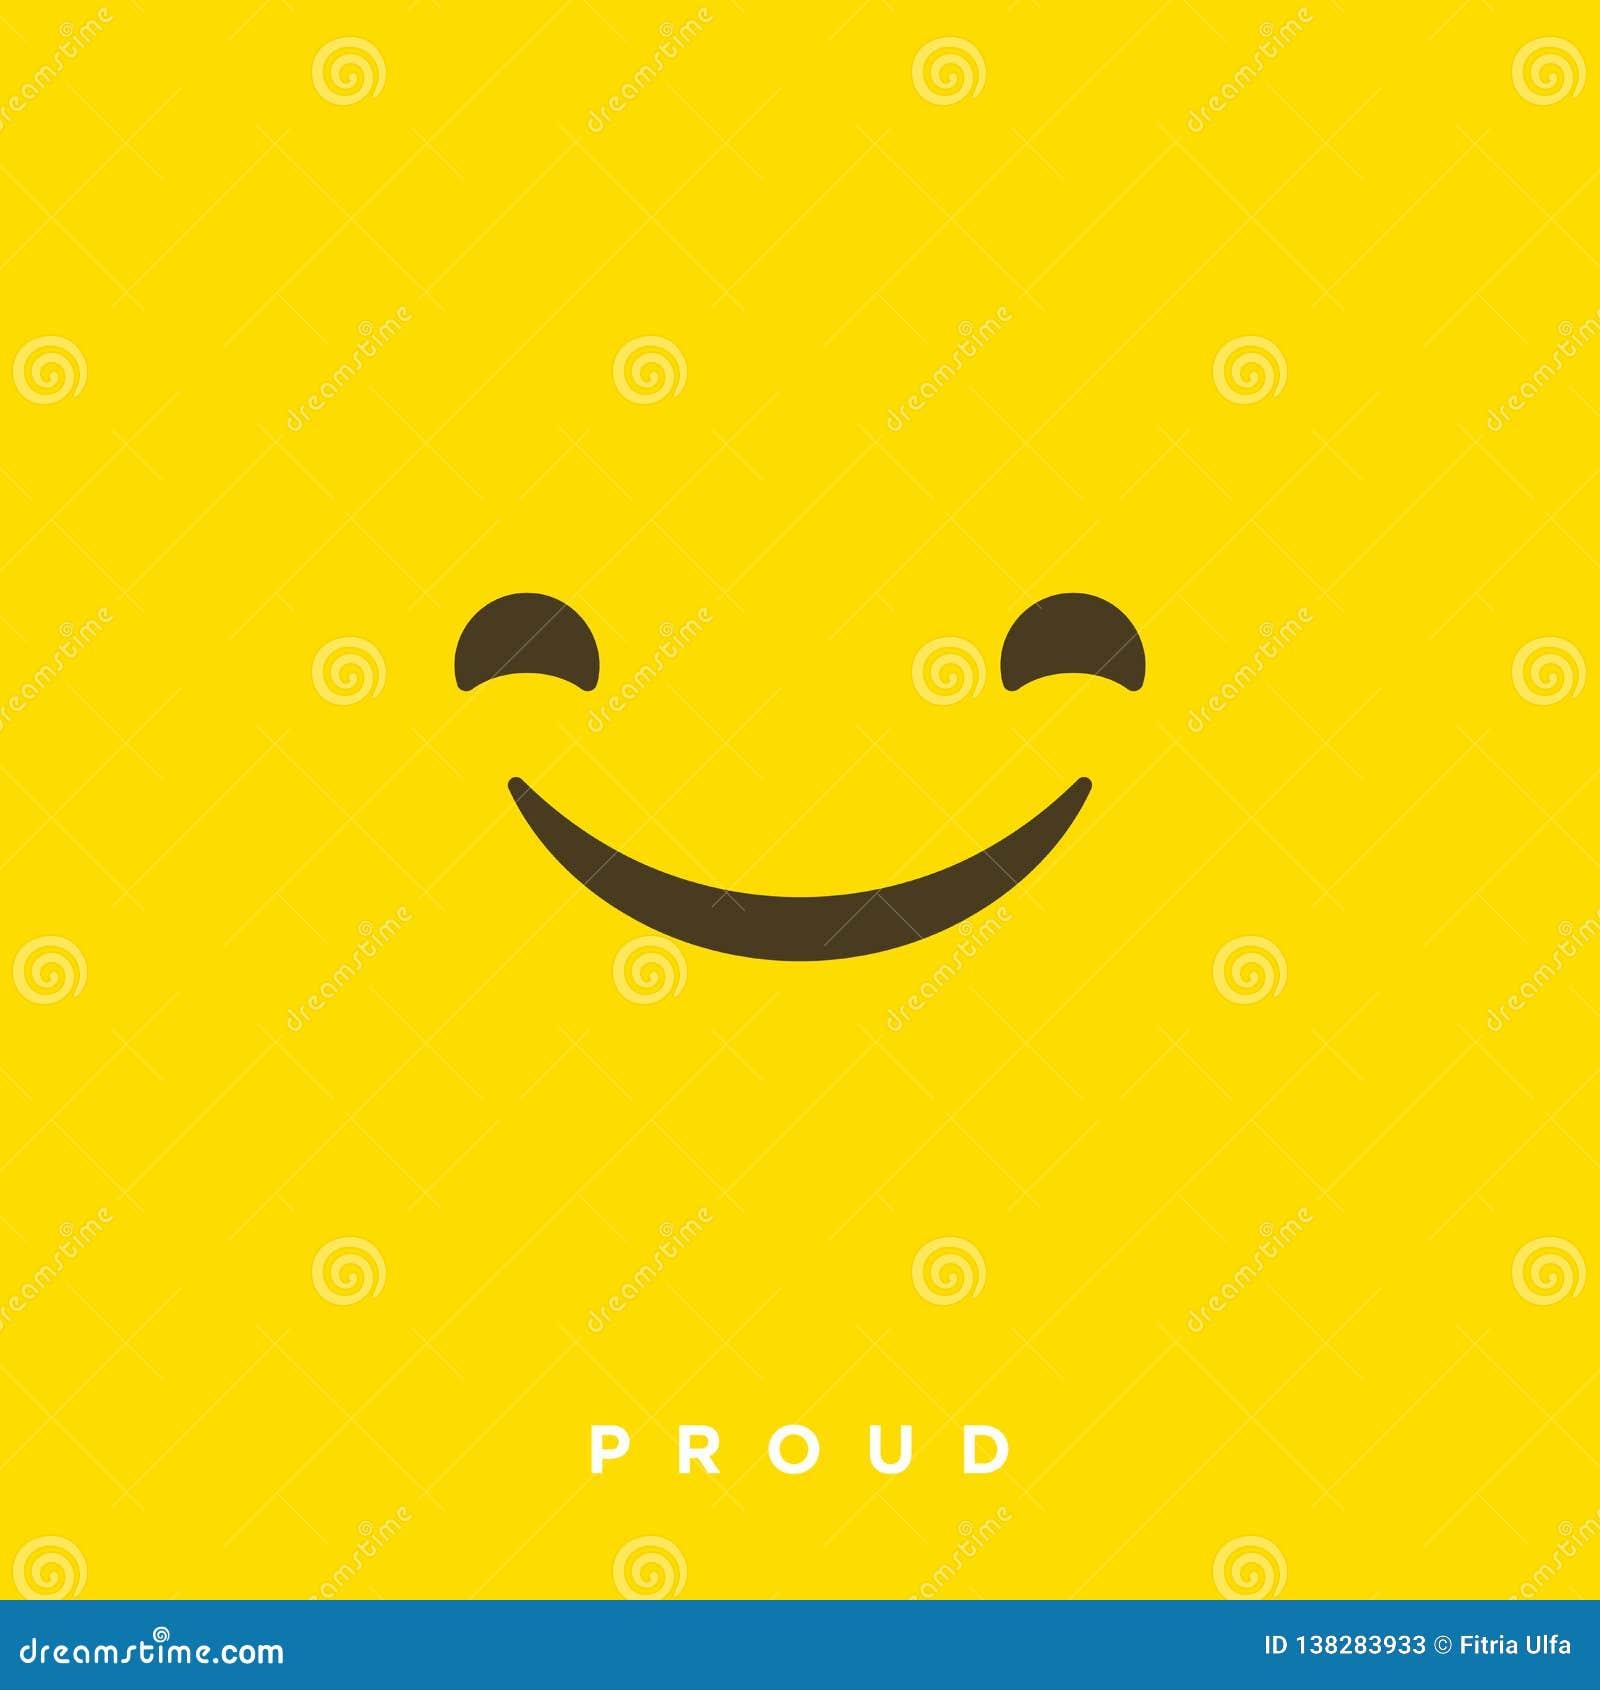 Vektorkarikatur der hohen Qualität mit stolzen Emoticons mit flacher Entwurfs-Art, Social Media-Reaktionen - Vektor EPS10